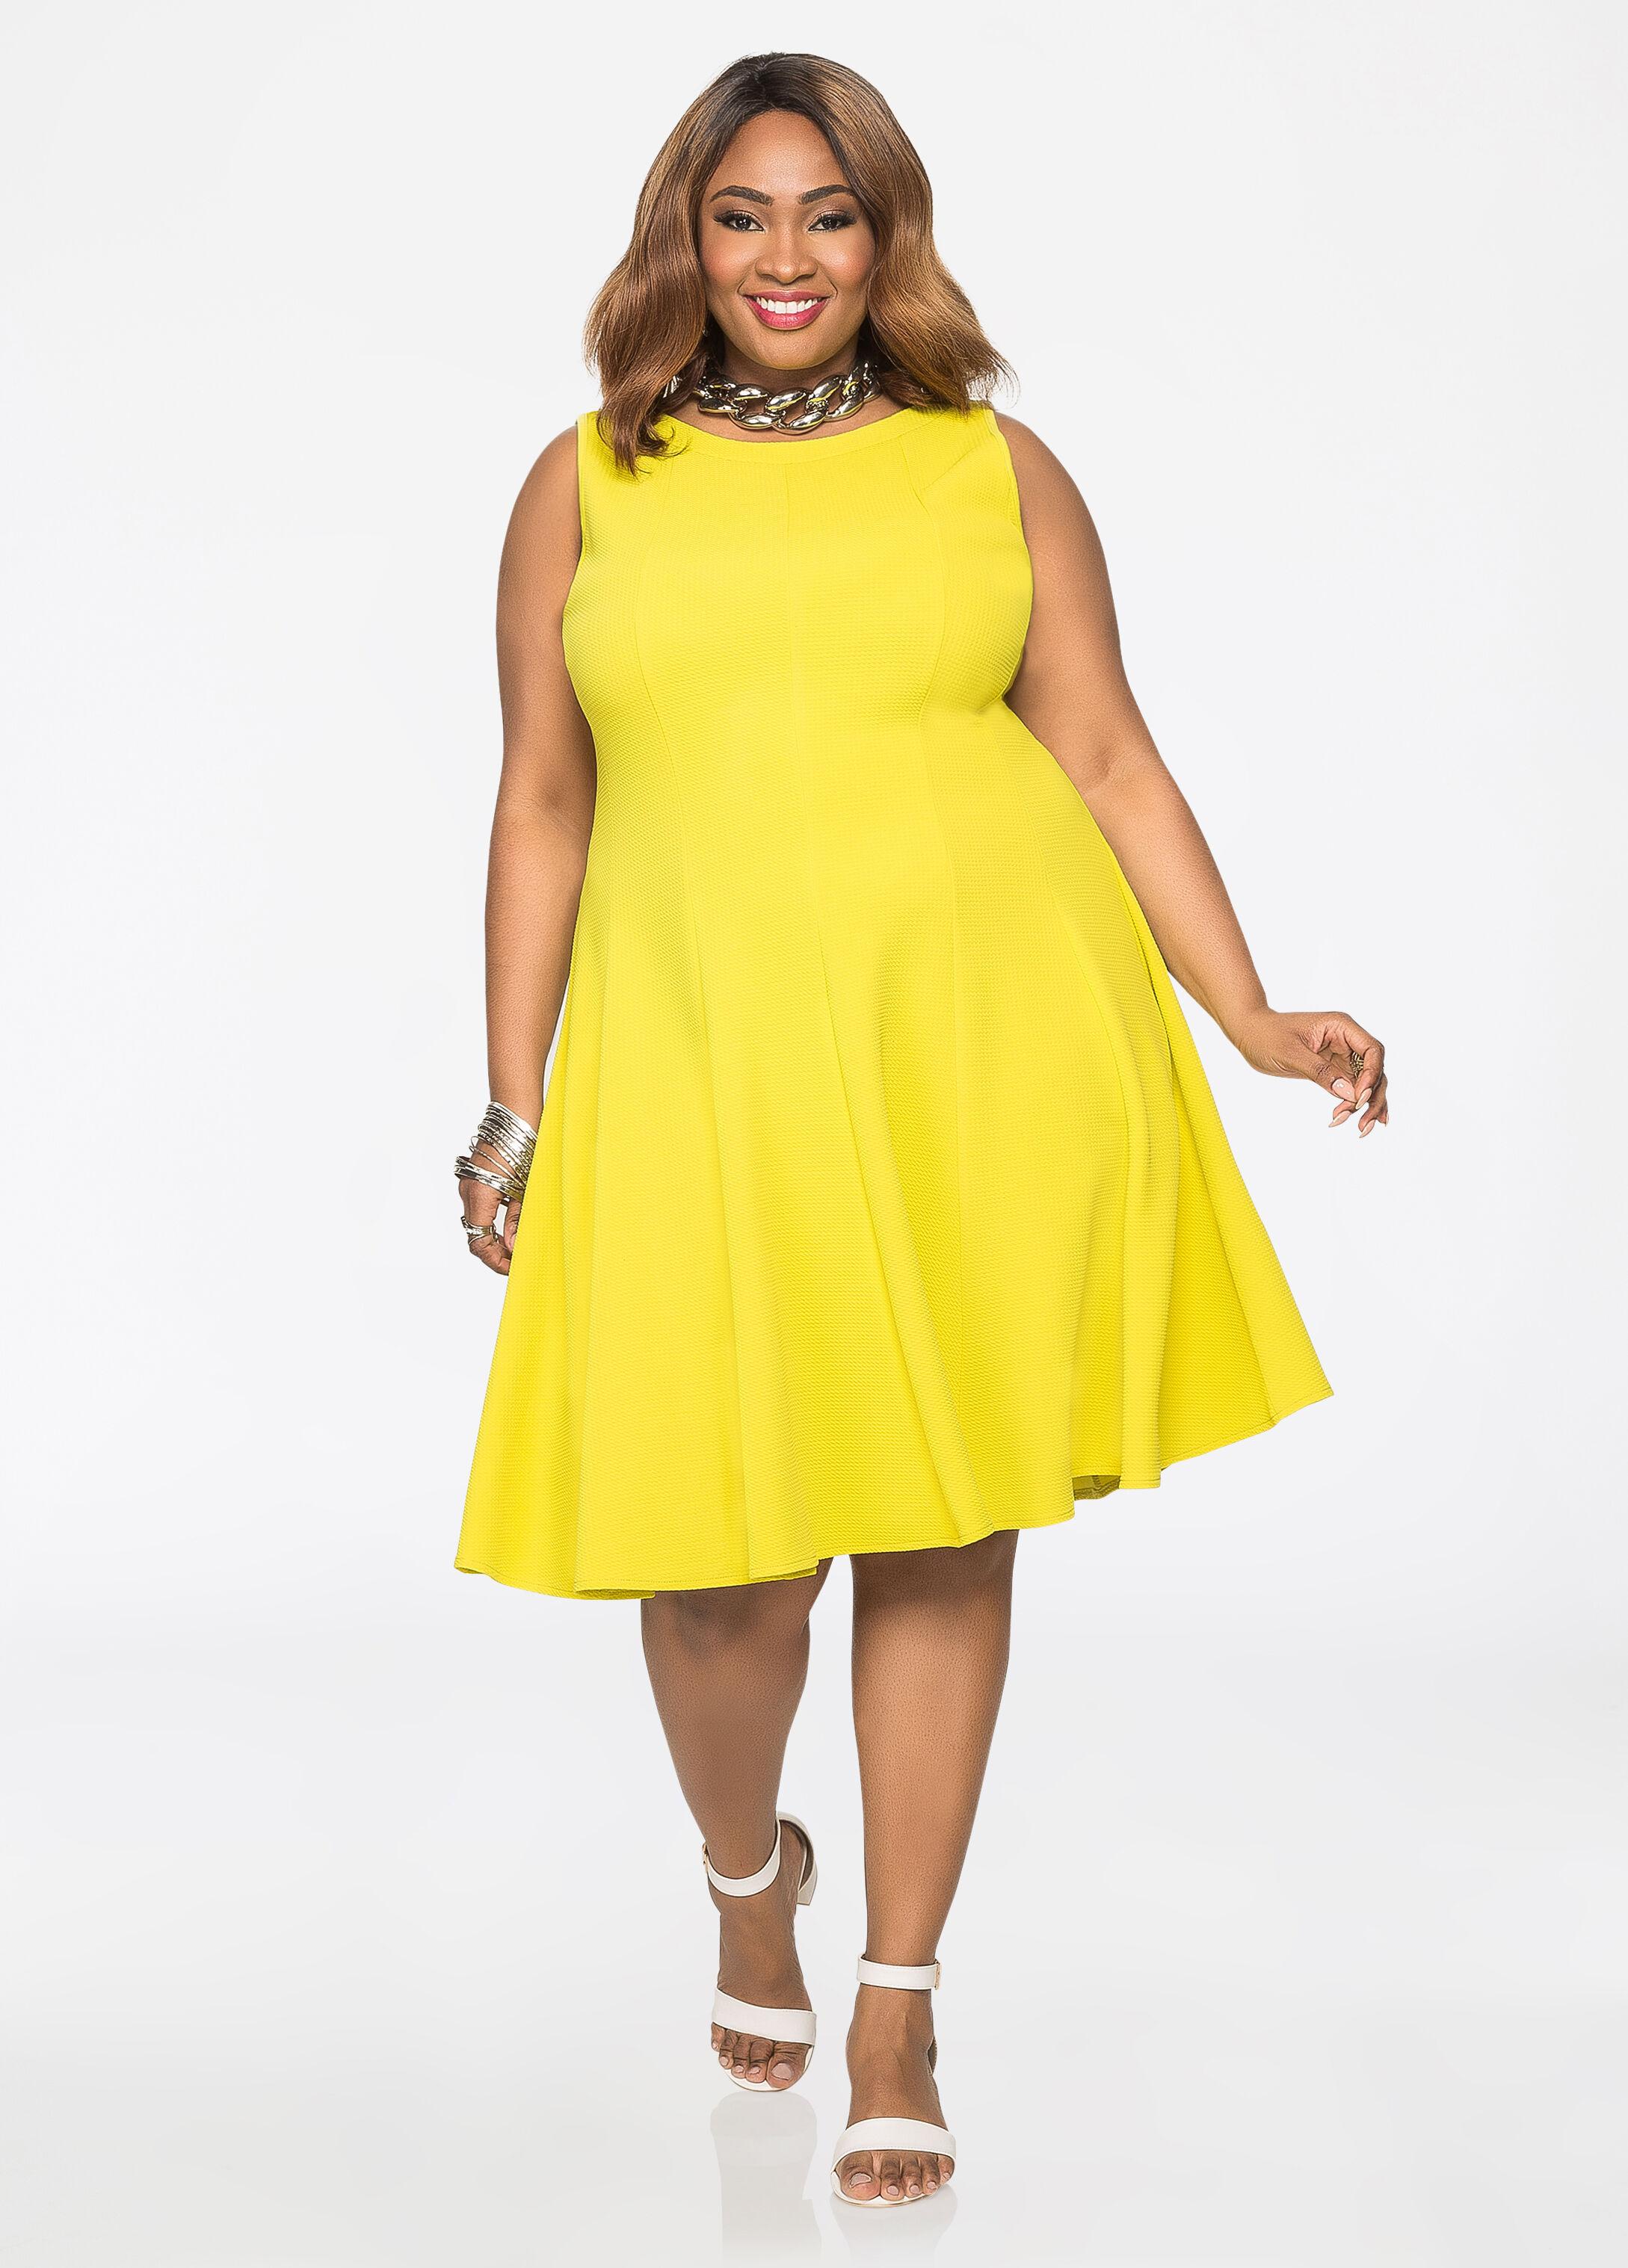 Plus Size Dresses  Sleeveless Fit n Flare Dress